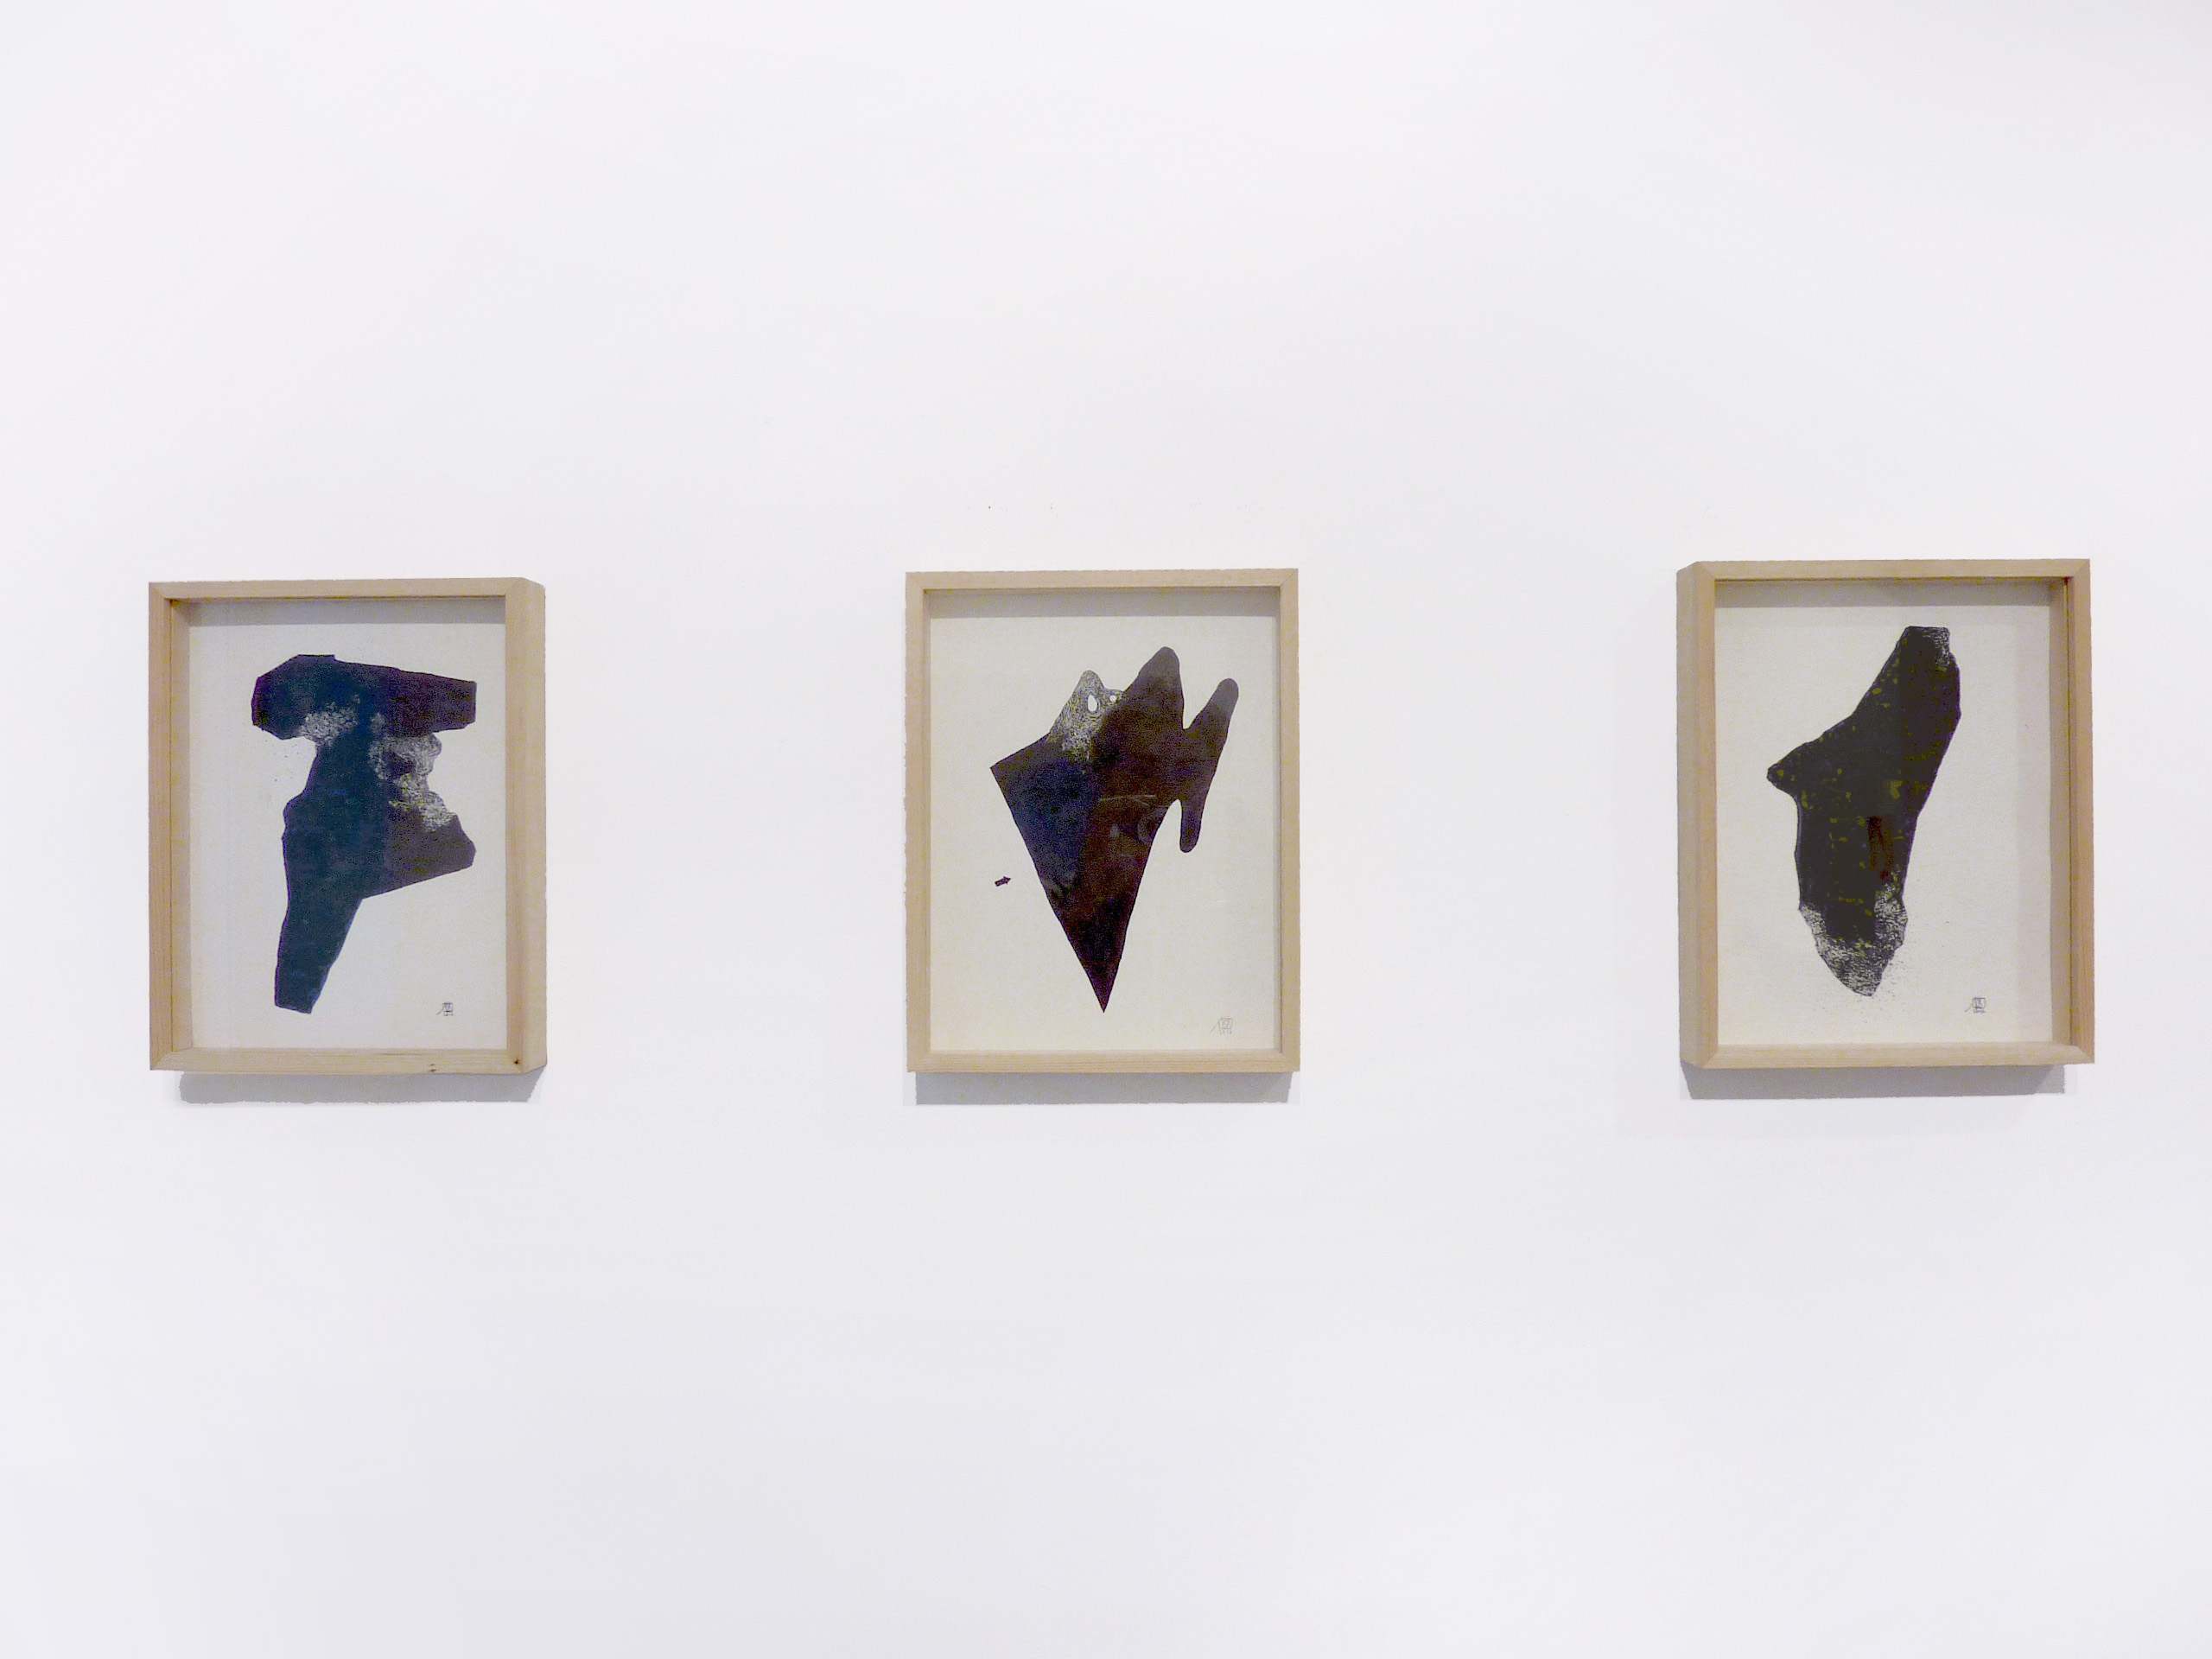 108-lava-at-van-der-gallery-recap-03